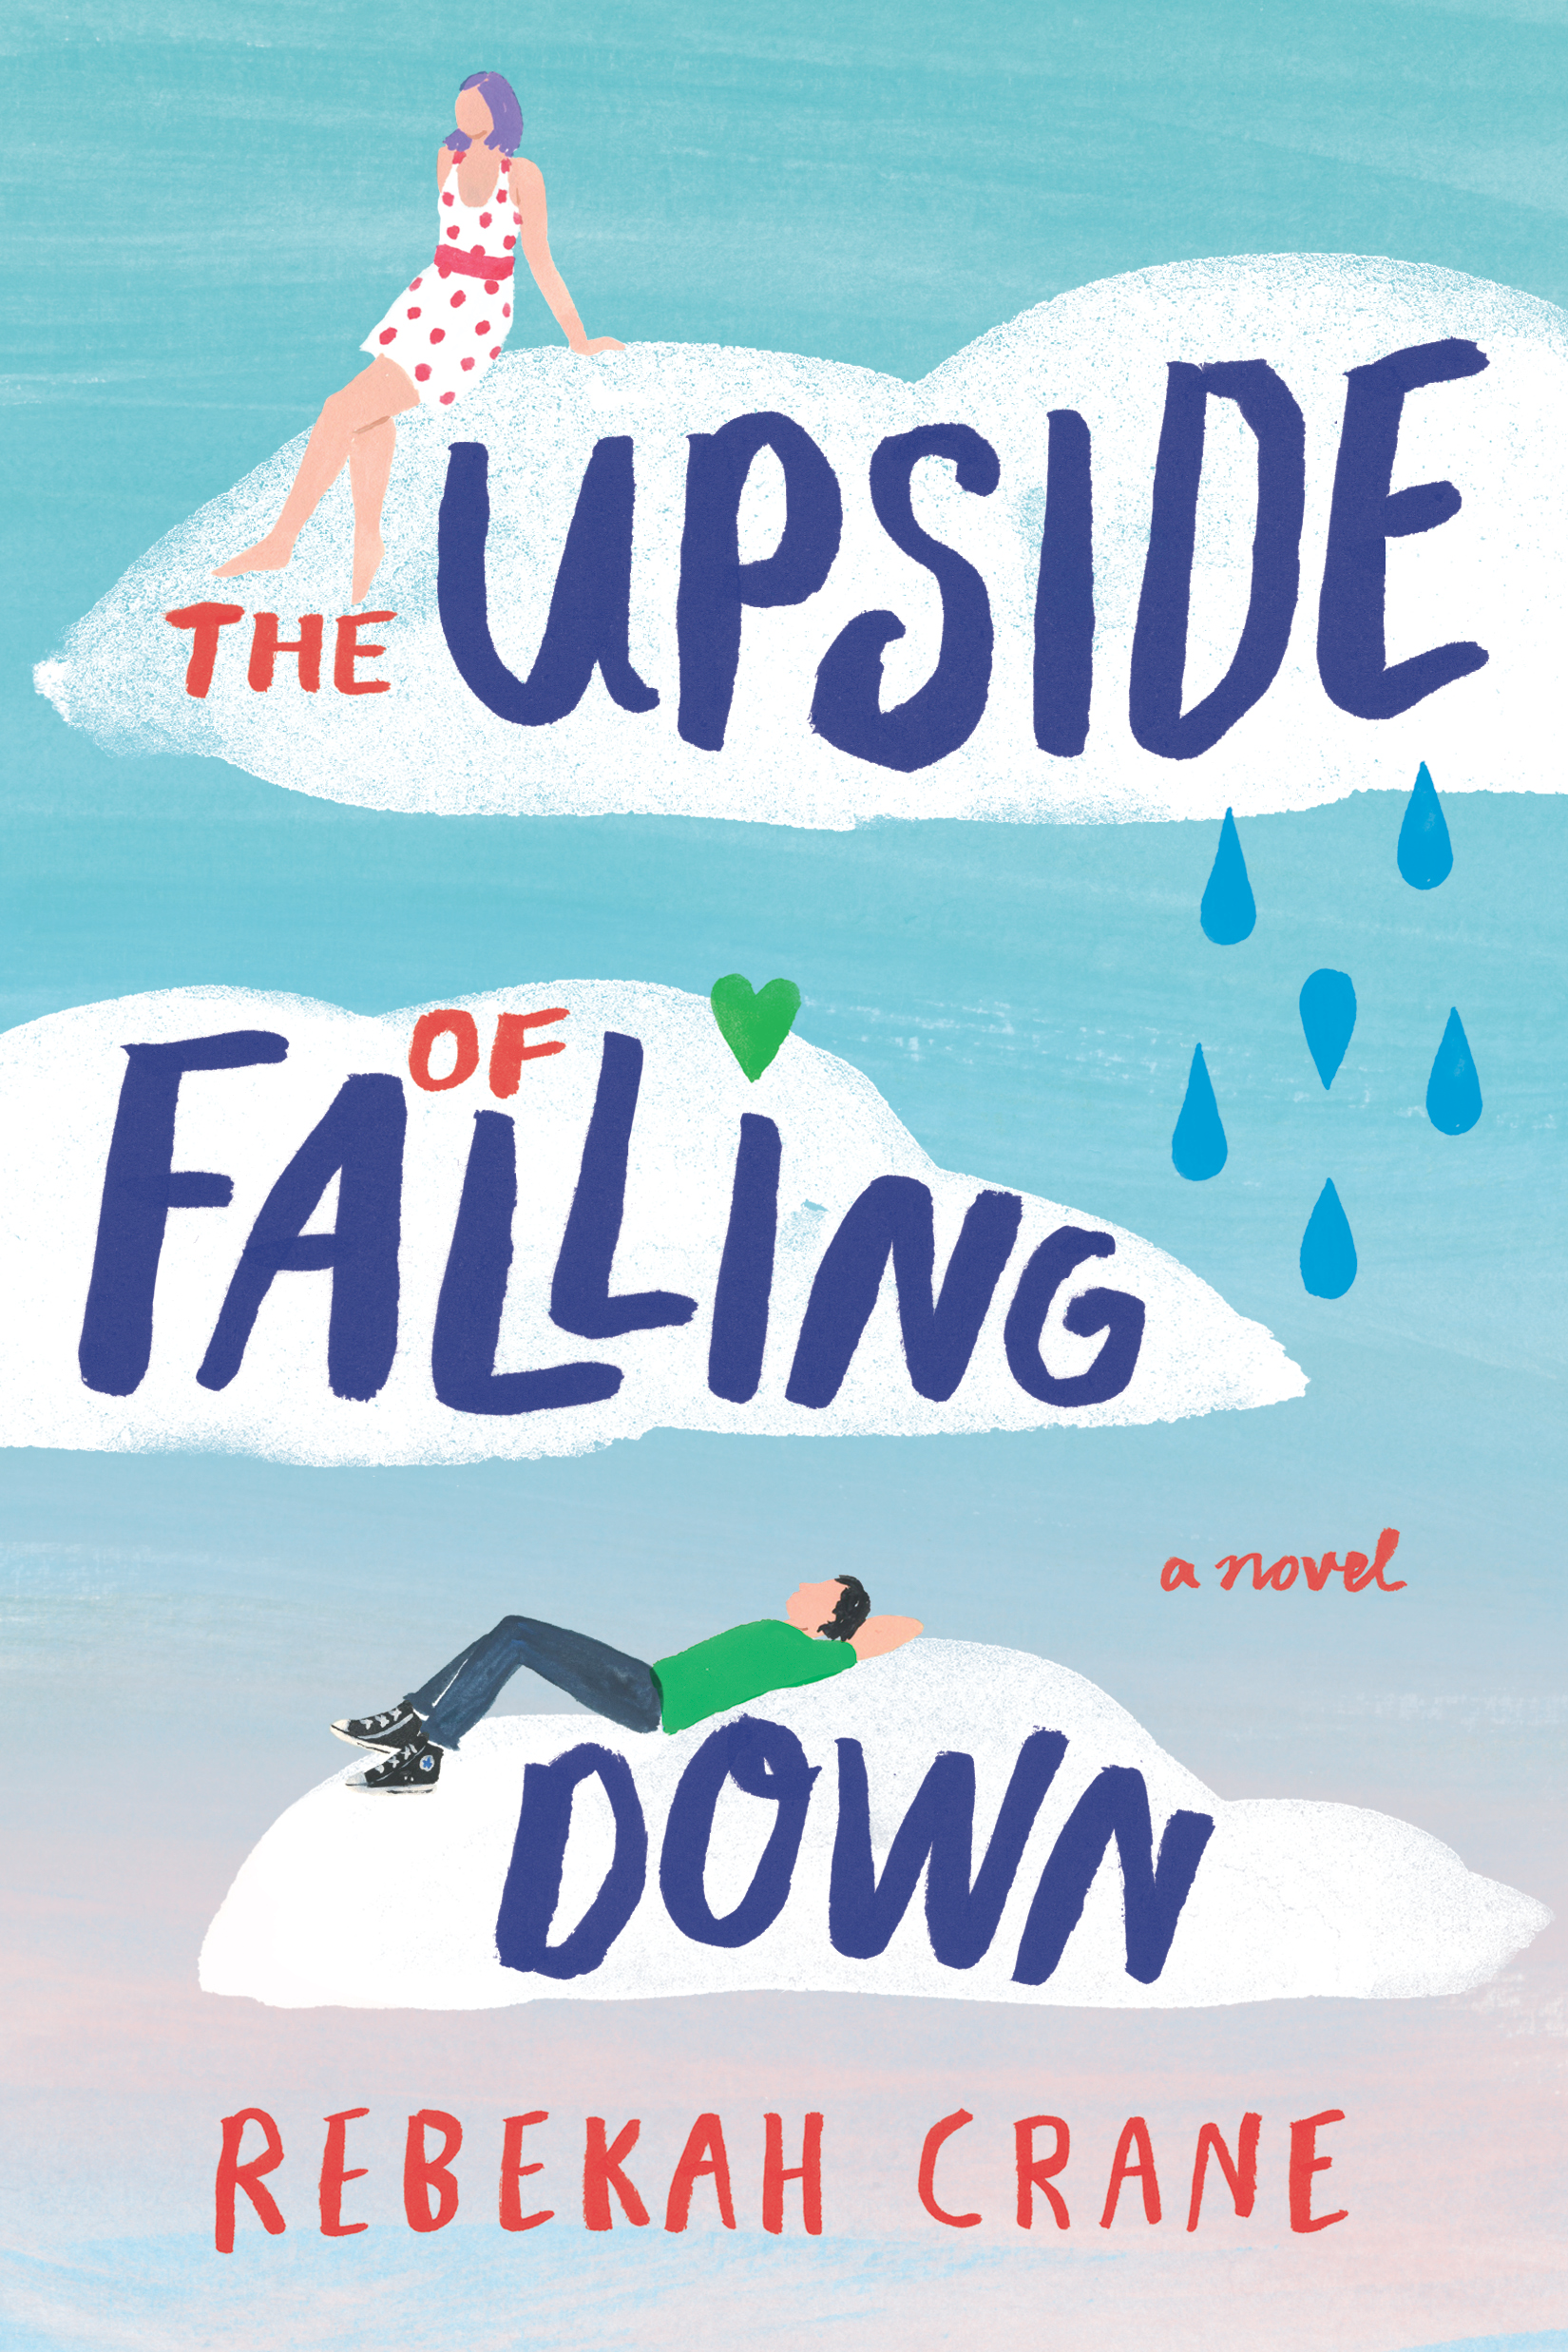 The Upside of Falling Down (1).jpg